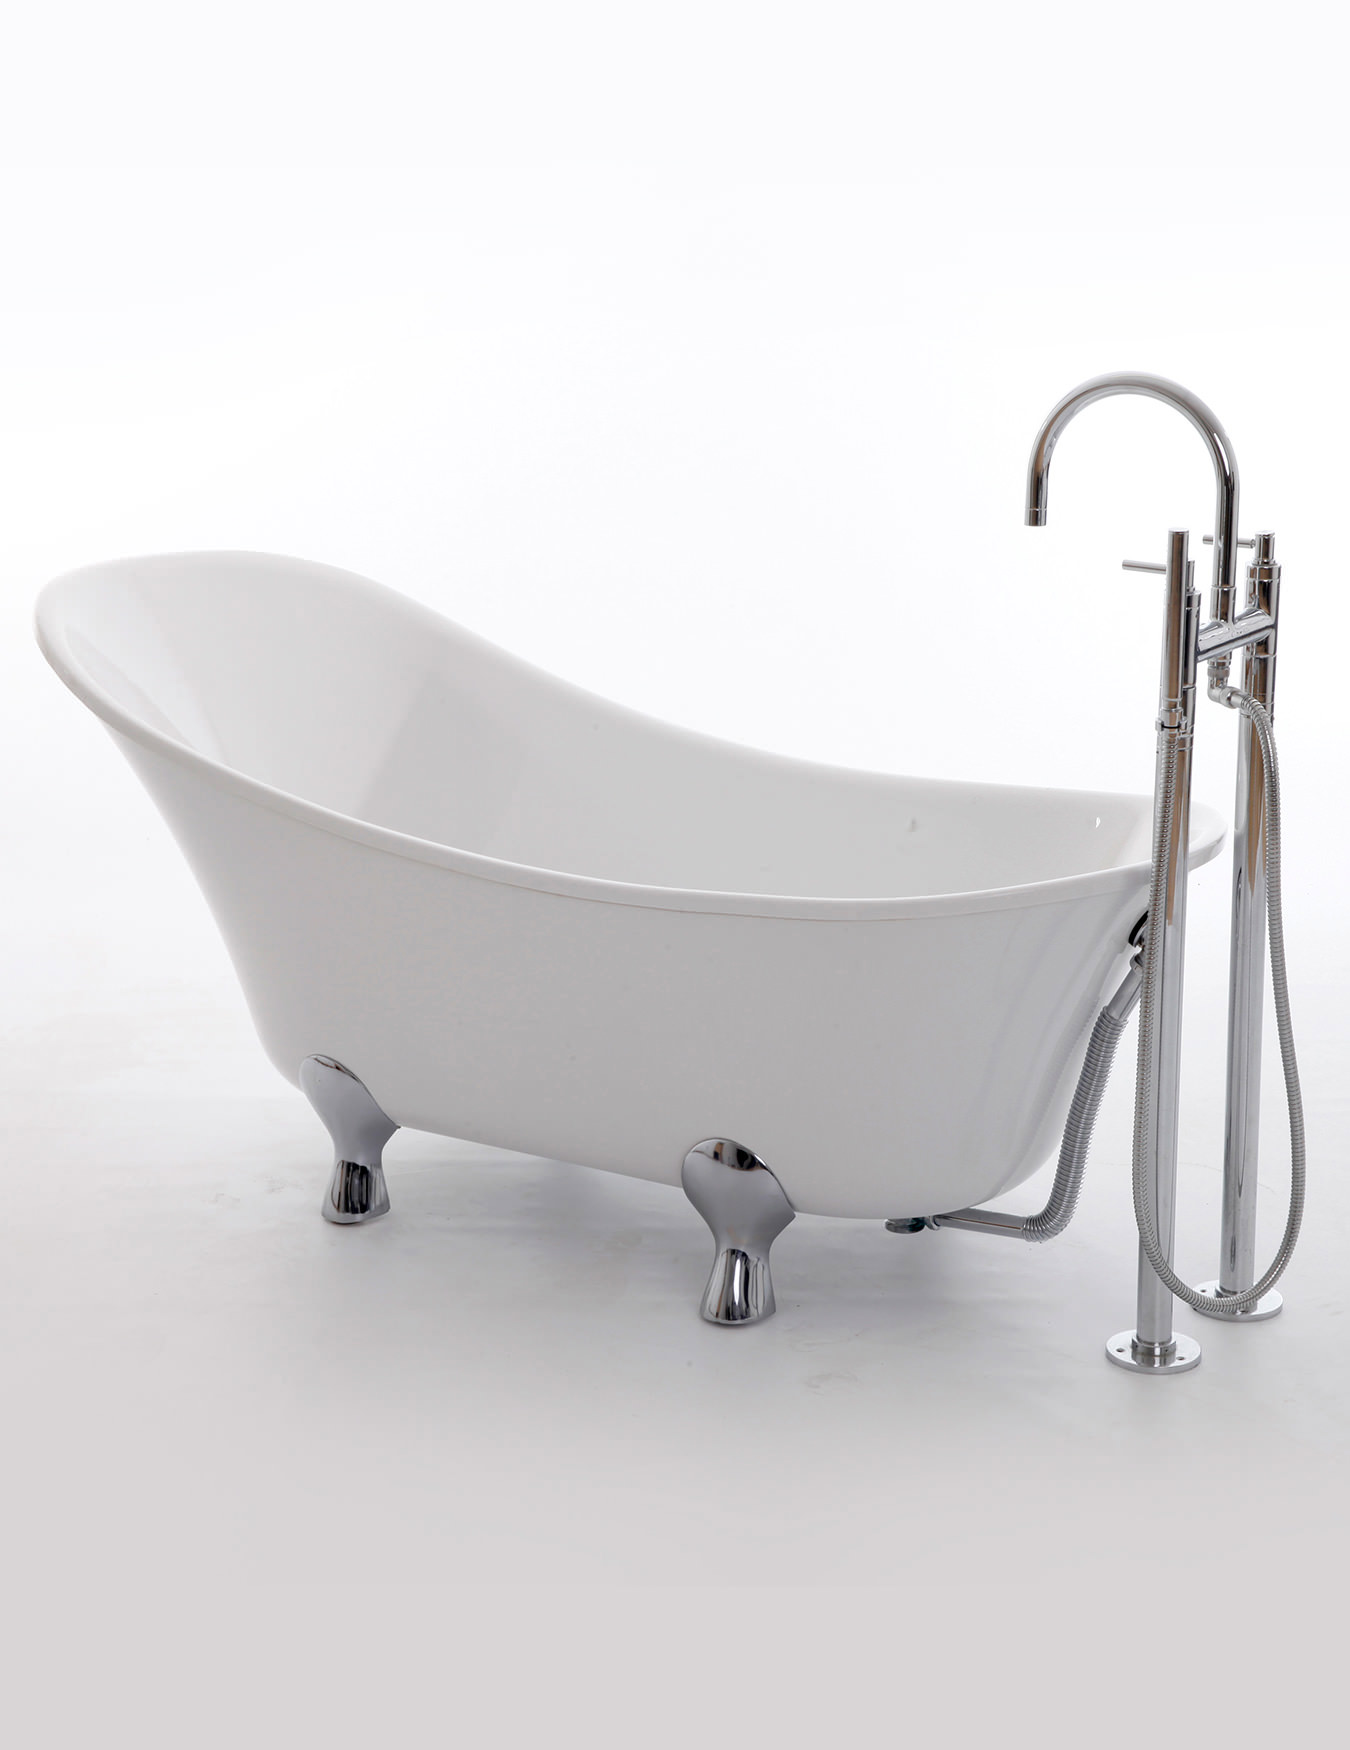 Royce Morgan Kingswood Freestanding Slipper Bath 1750 x 740mm